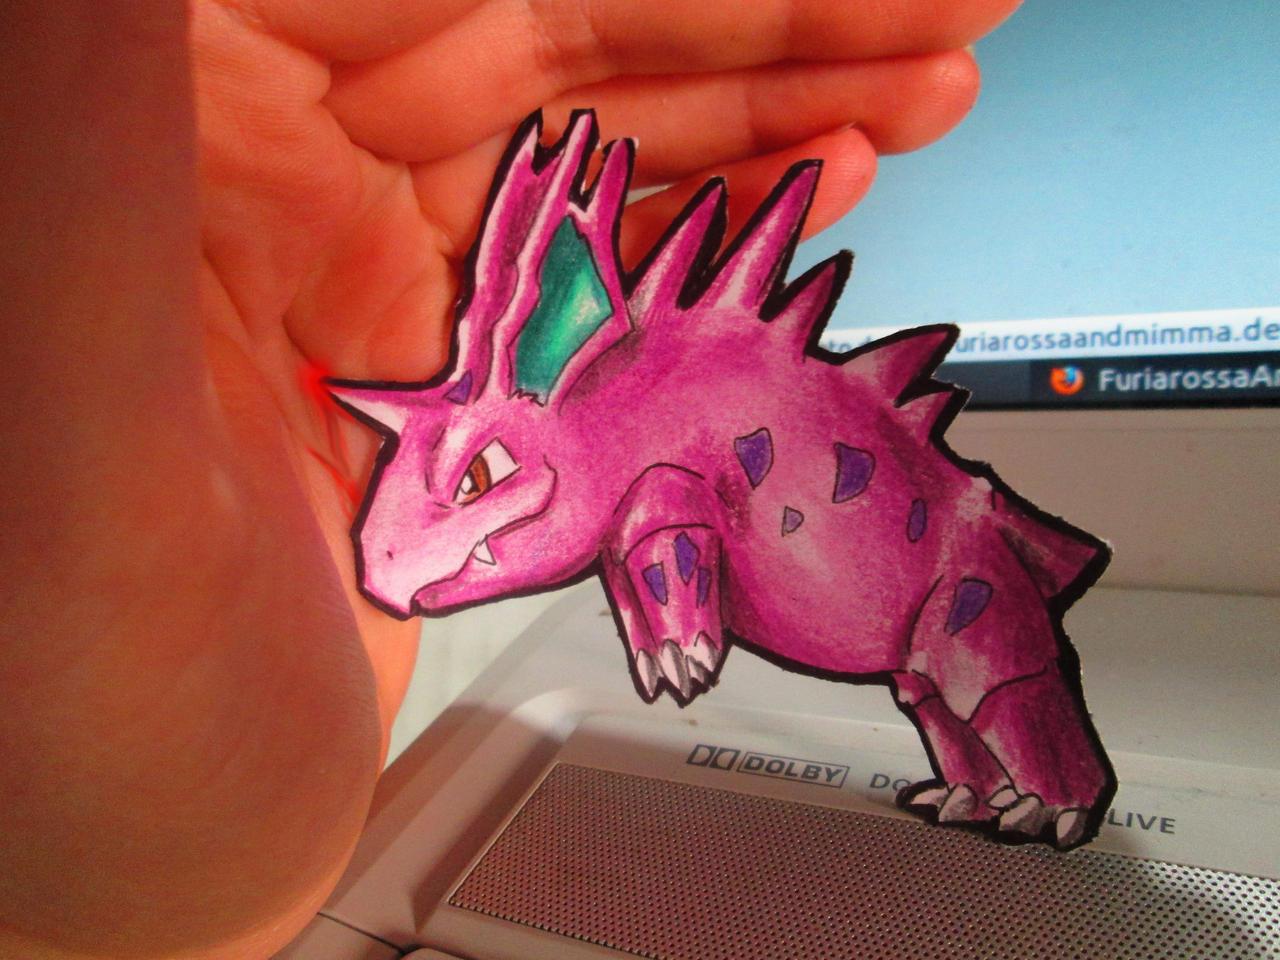 Paperchild 89. Pokemon#33 - Nidorino by FuriarossaAndMimma